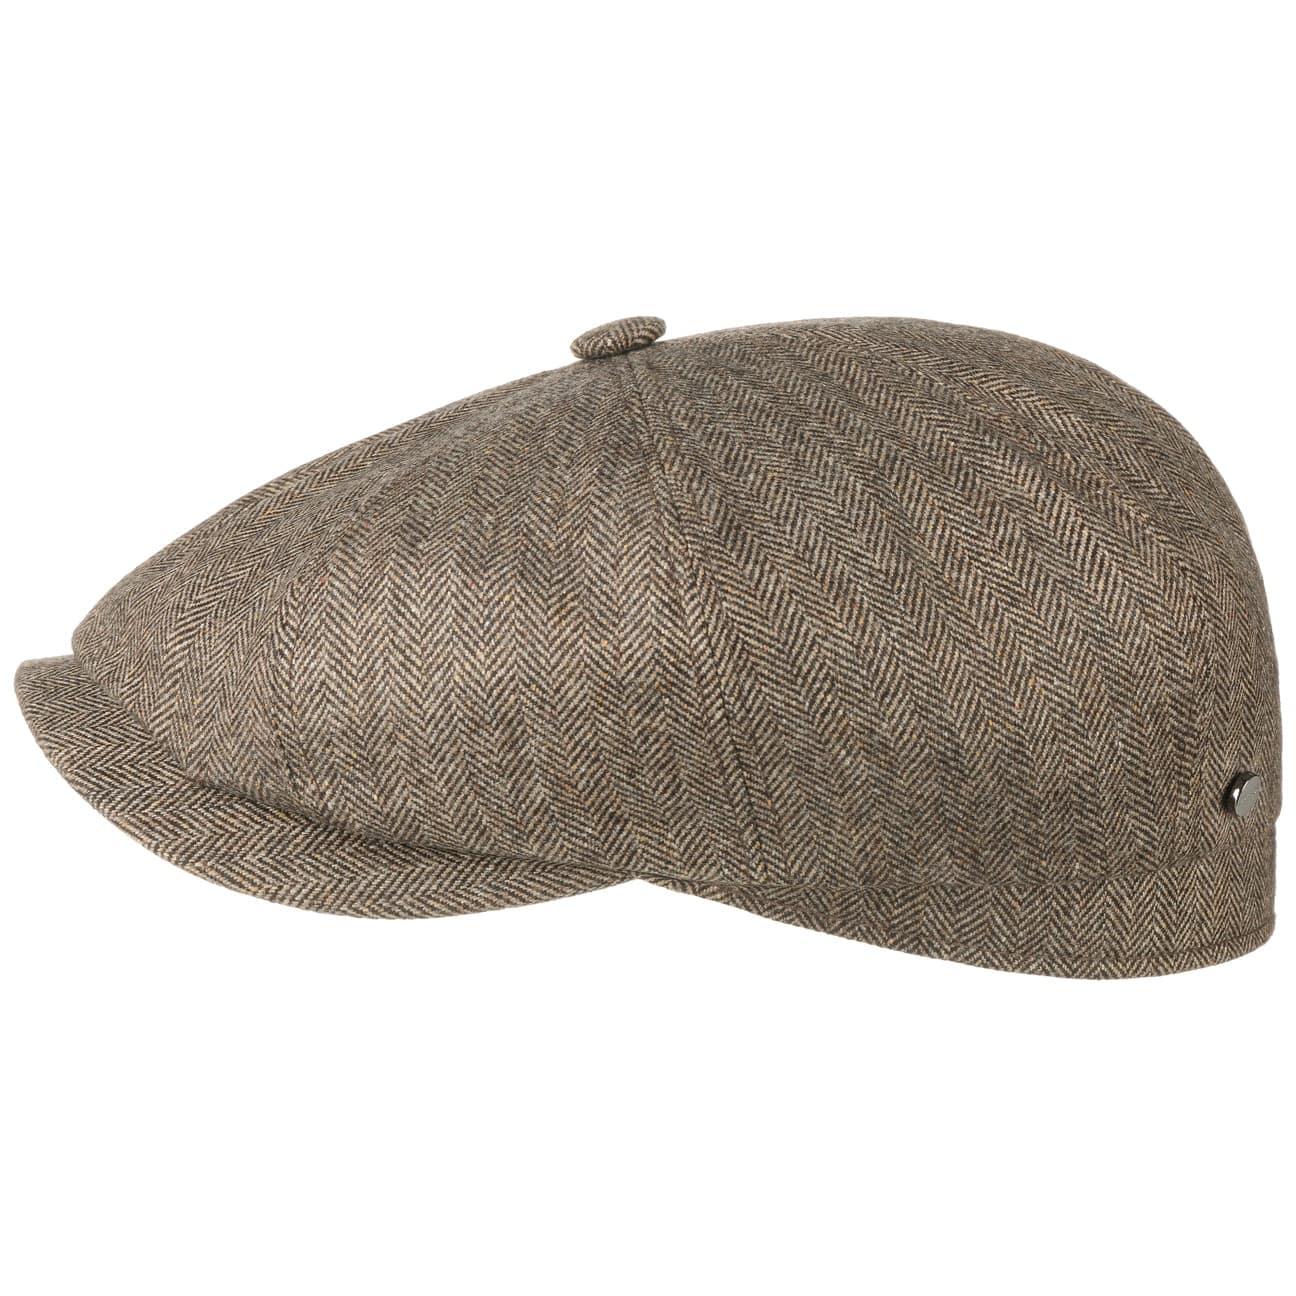 aa7bdf4d ... Hatteras Cashmere Silk Flat Cap by Stetson - brown 1 ...